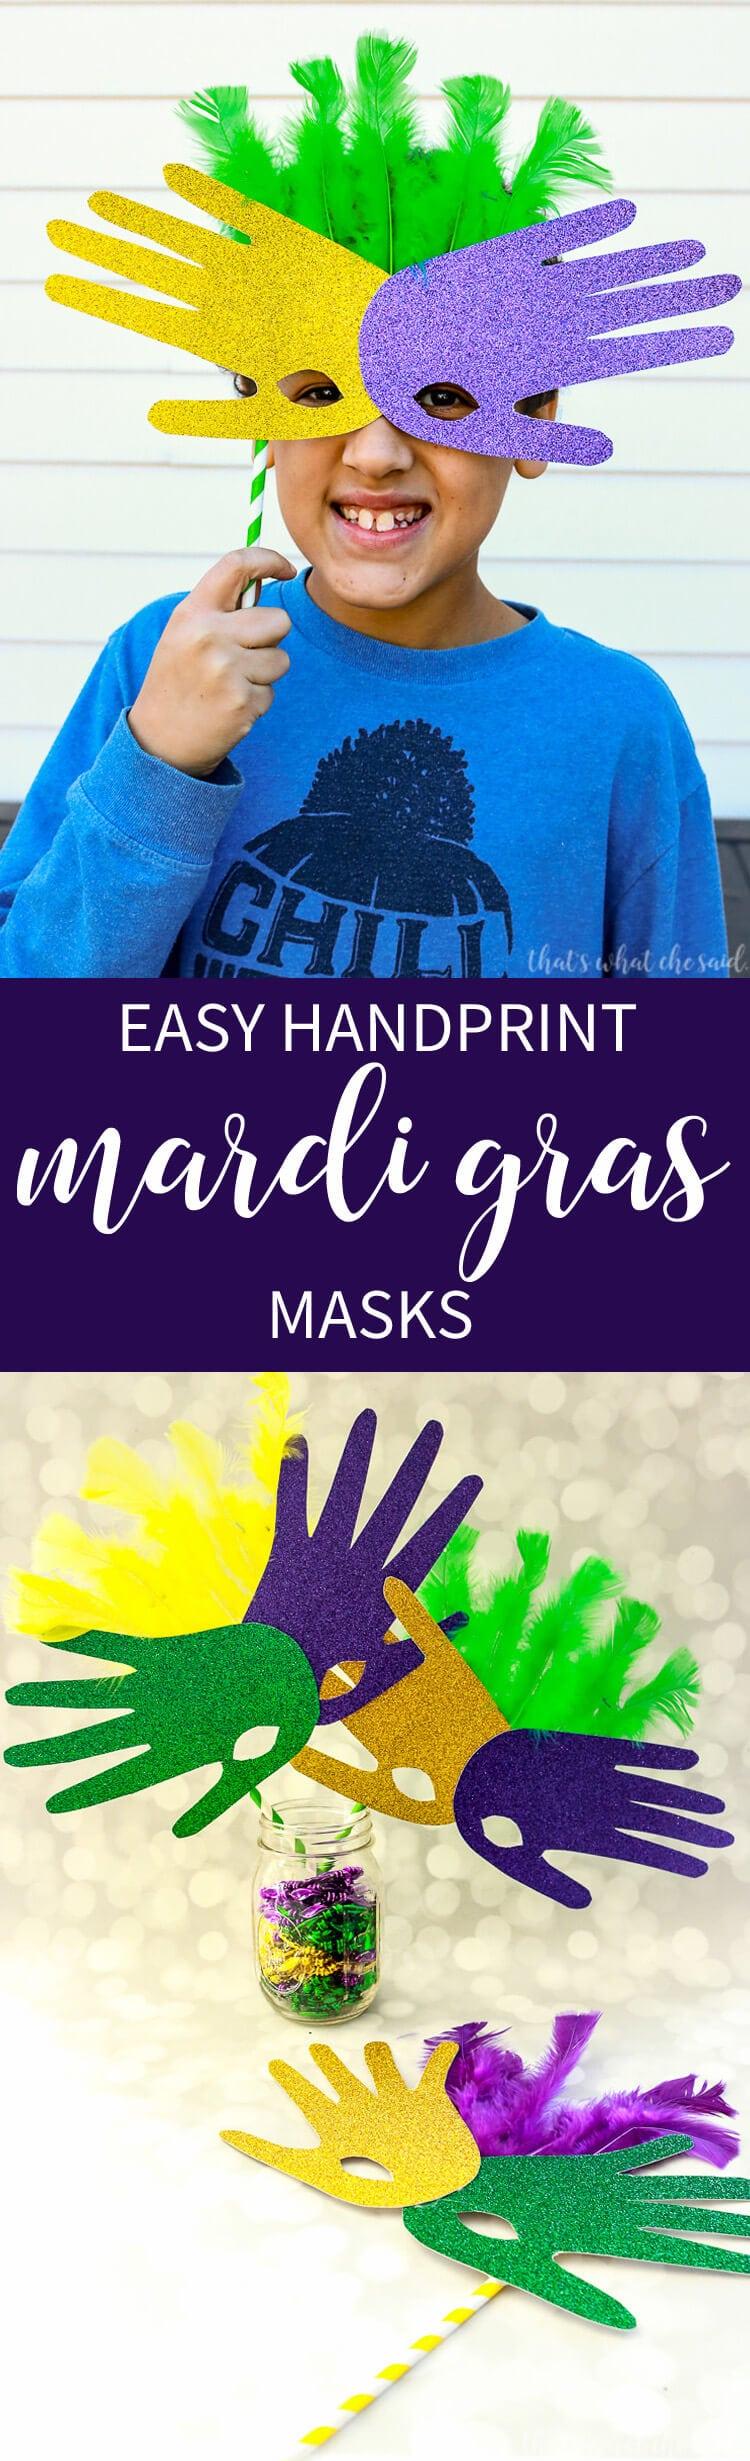 Handprint Mask - Mardi Gras Craft Project